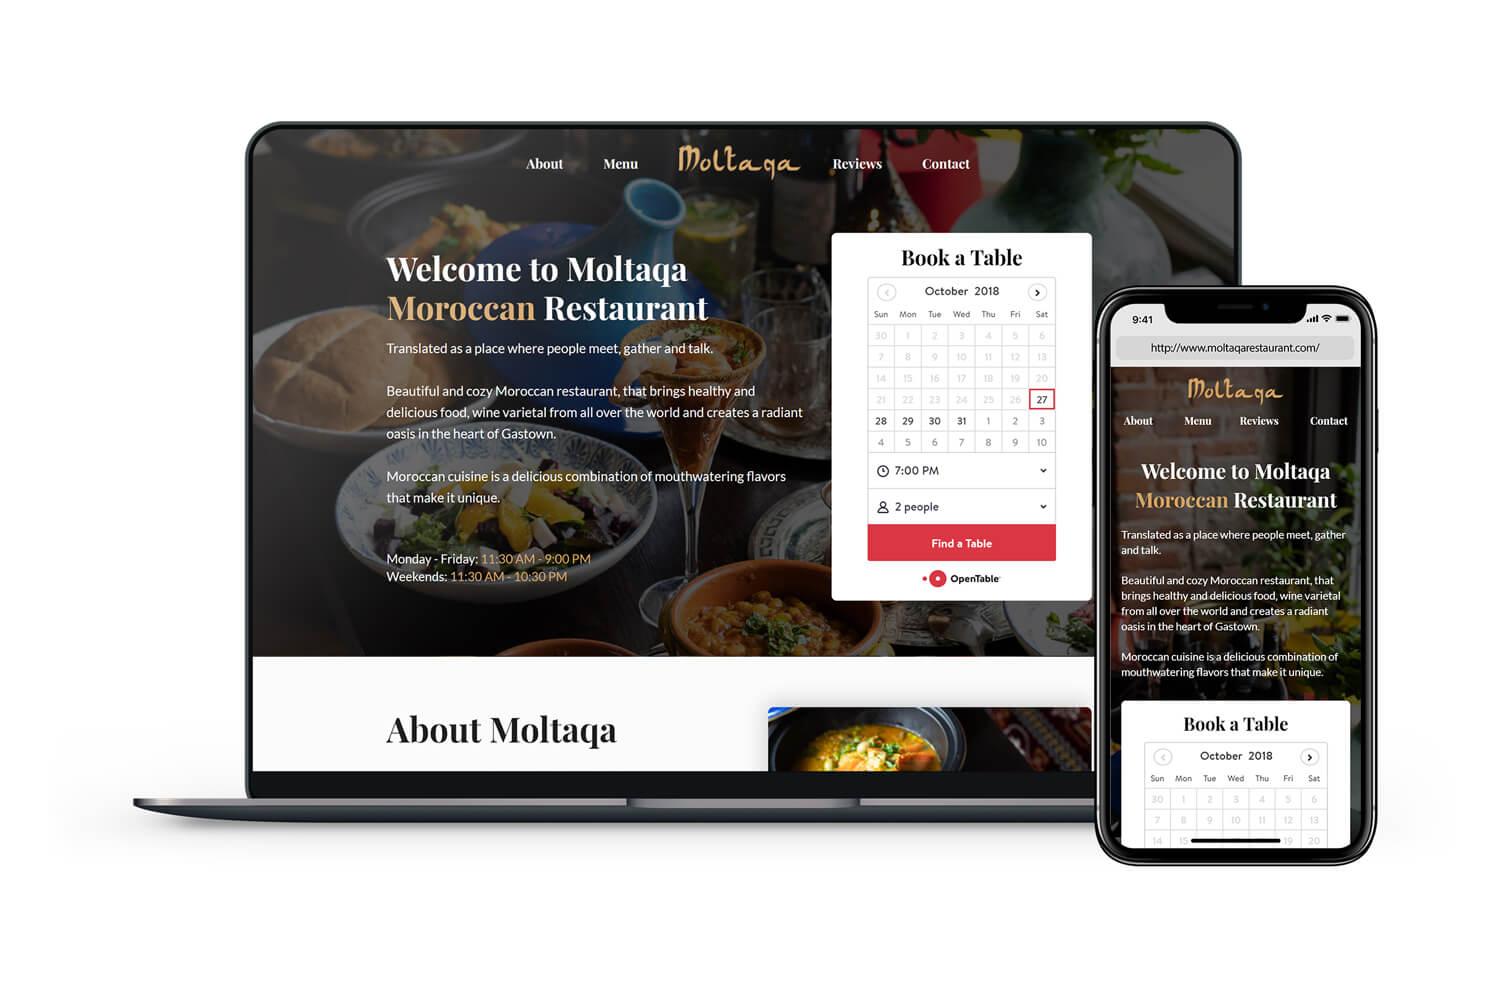 Moltaqa Moroccan Restaurant